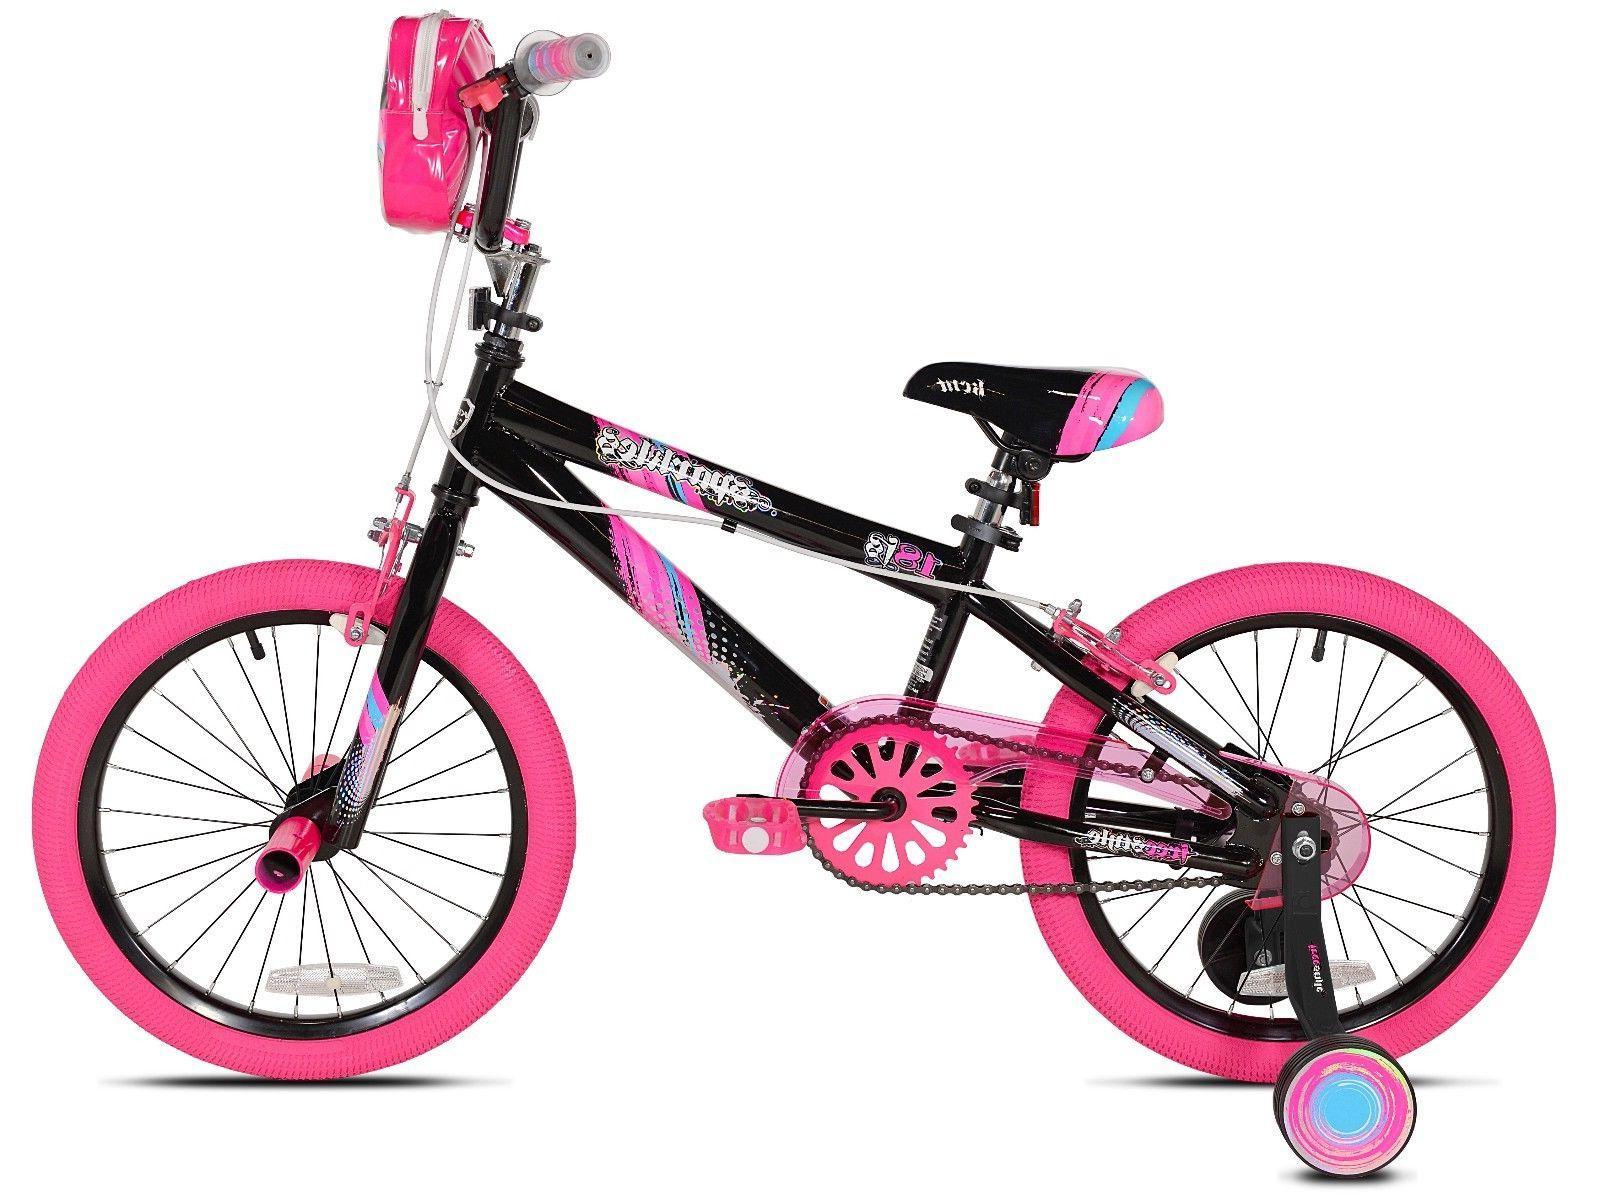 Bmx Bikes For Girls 18 Inch Balance With Training Wheels 1 S